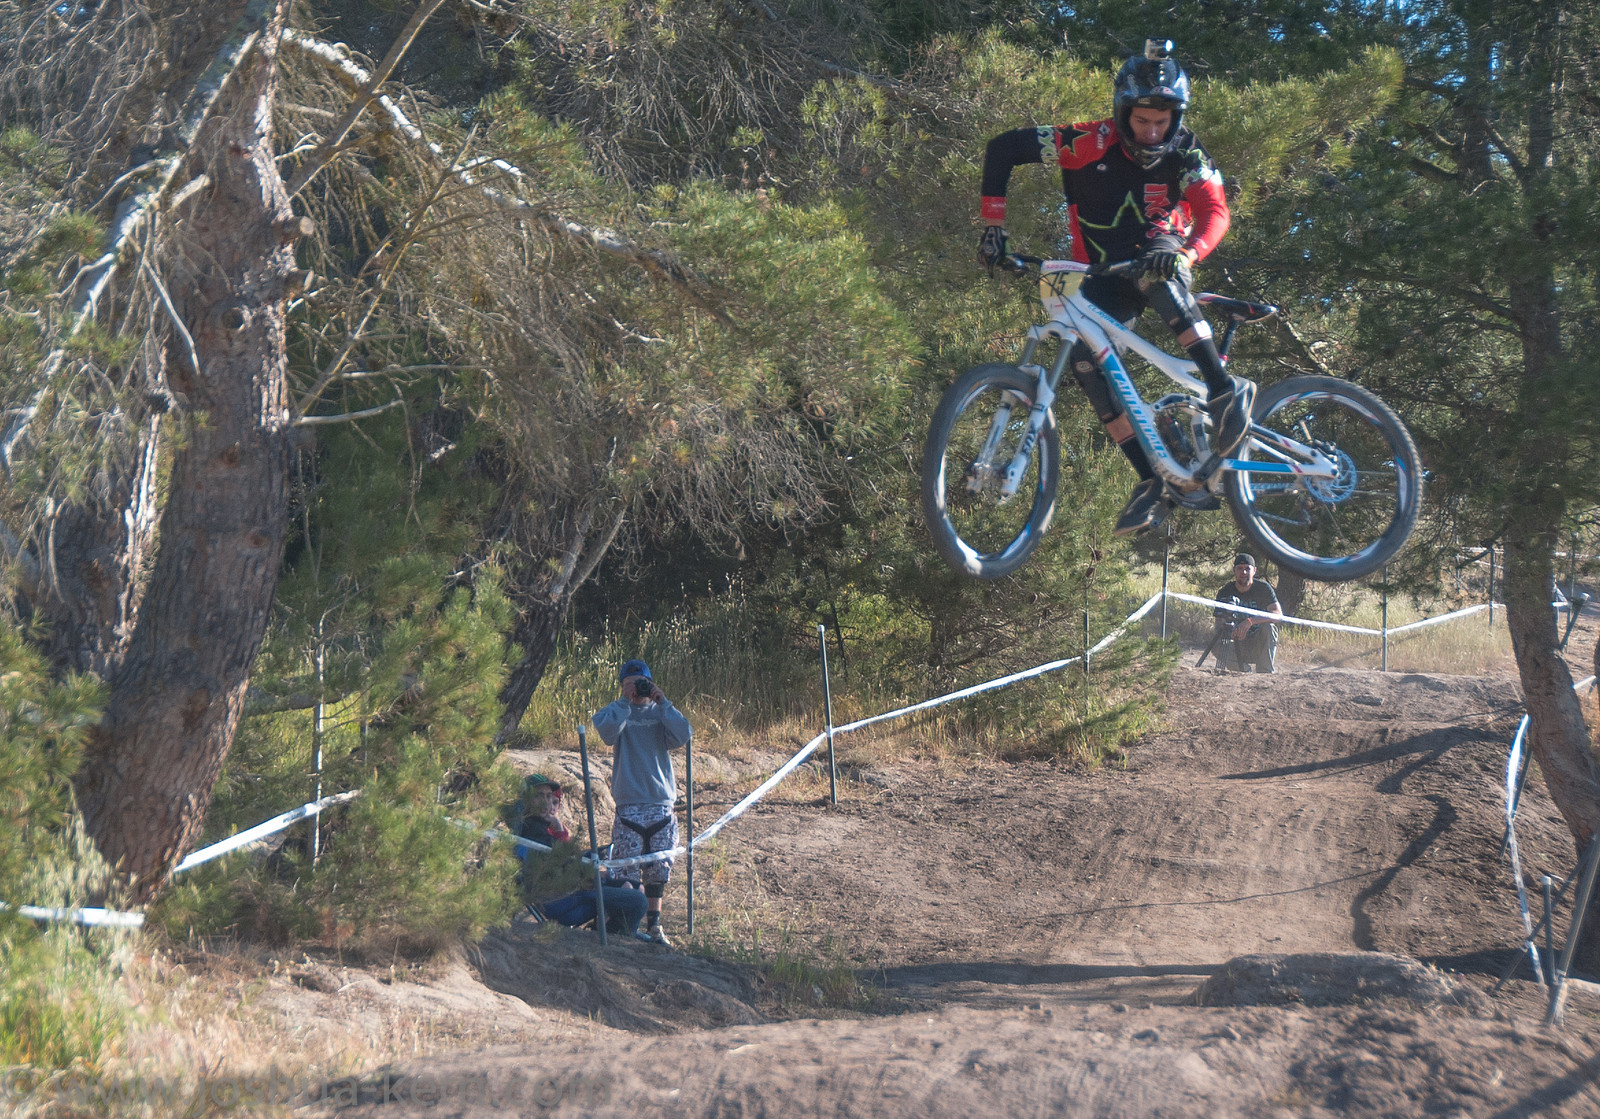 4-19-13DHPractice (2 of 36) - jkern620 - Mountain Biking Pictures - Vital MTB